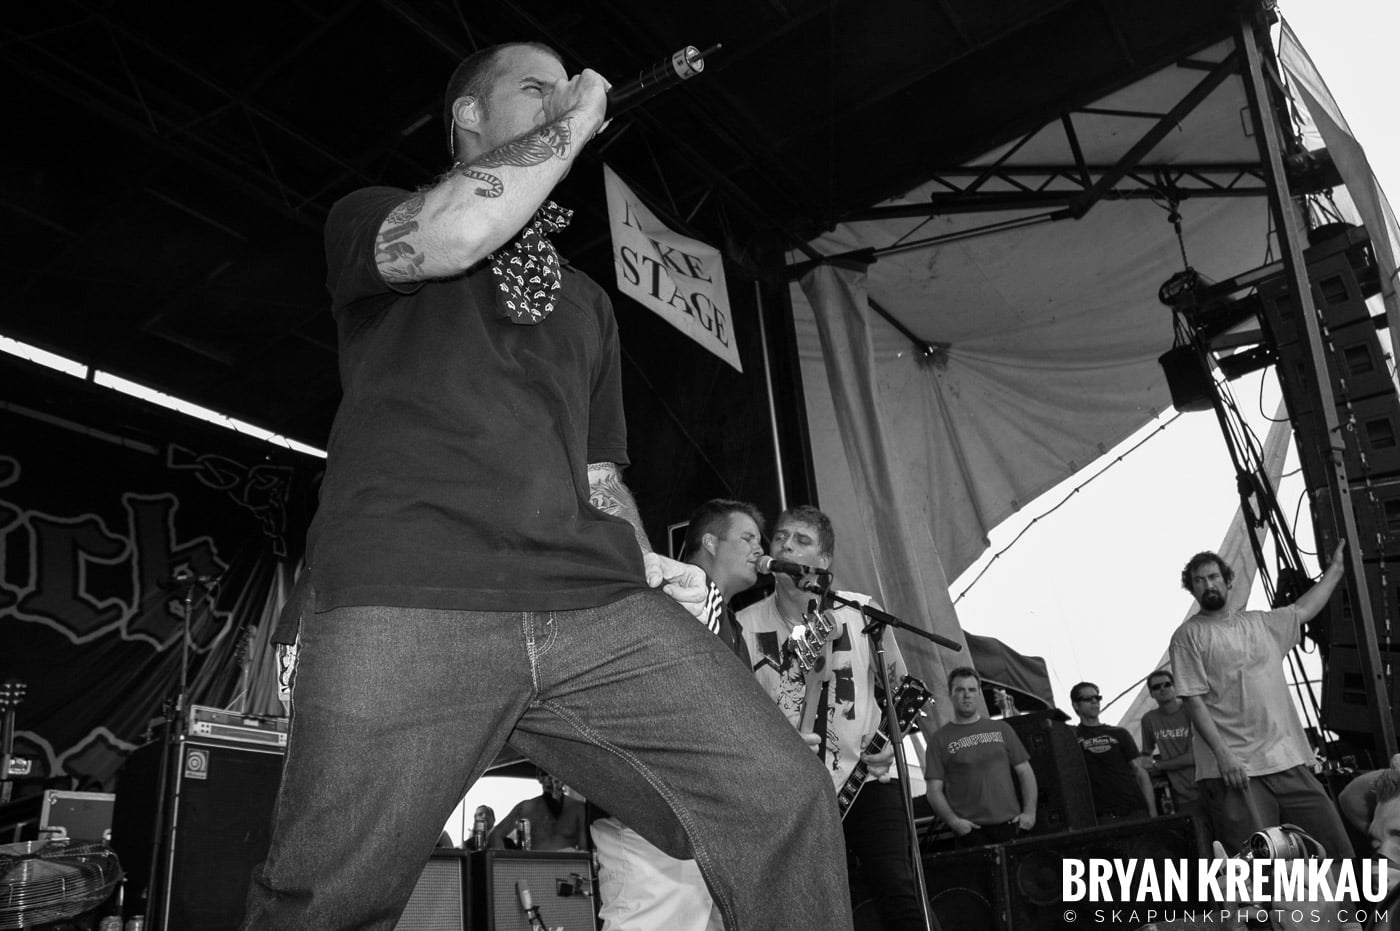 Dropkick Murphys @ Warped Tour 05, NYC - 8.12.05 (1)